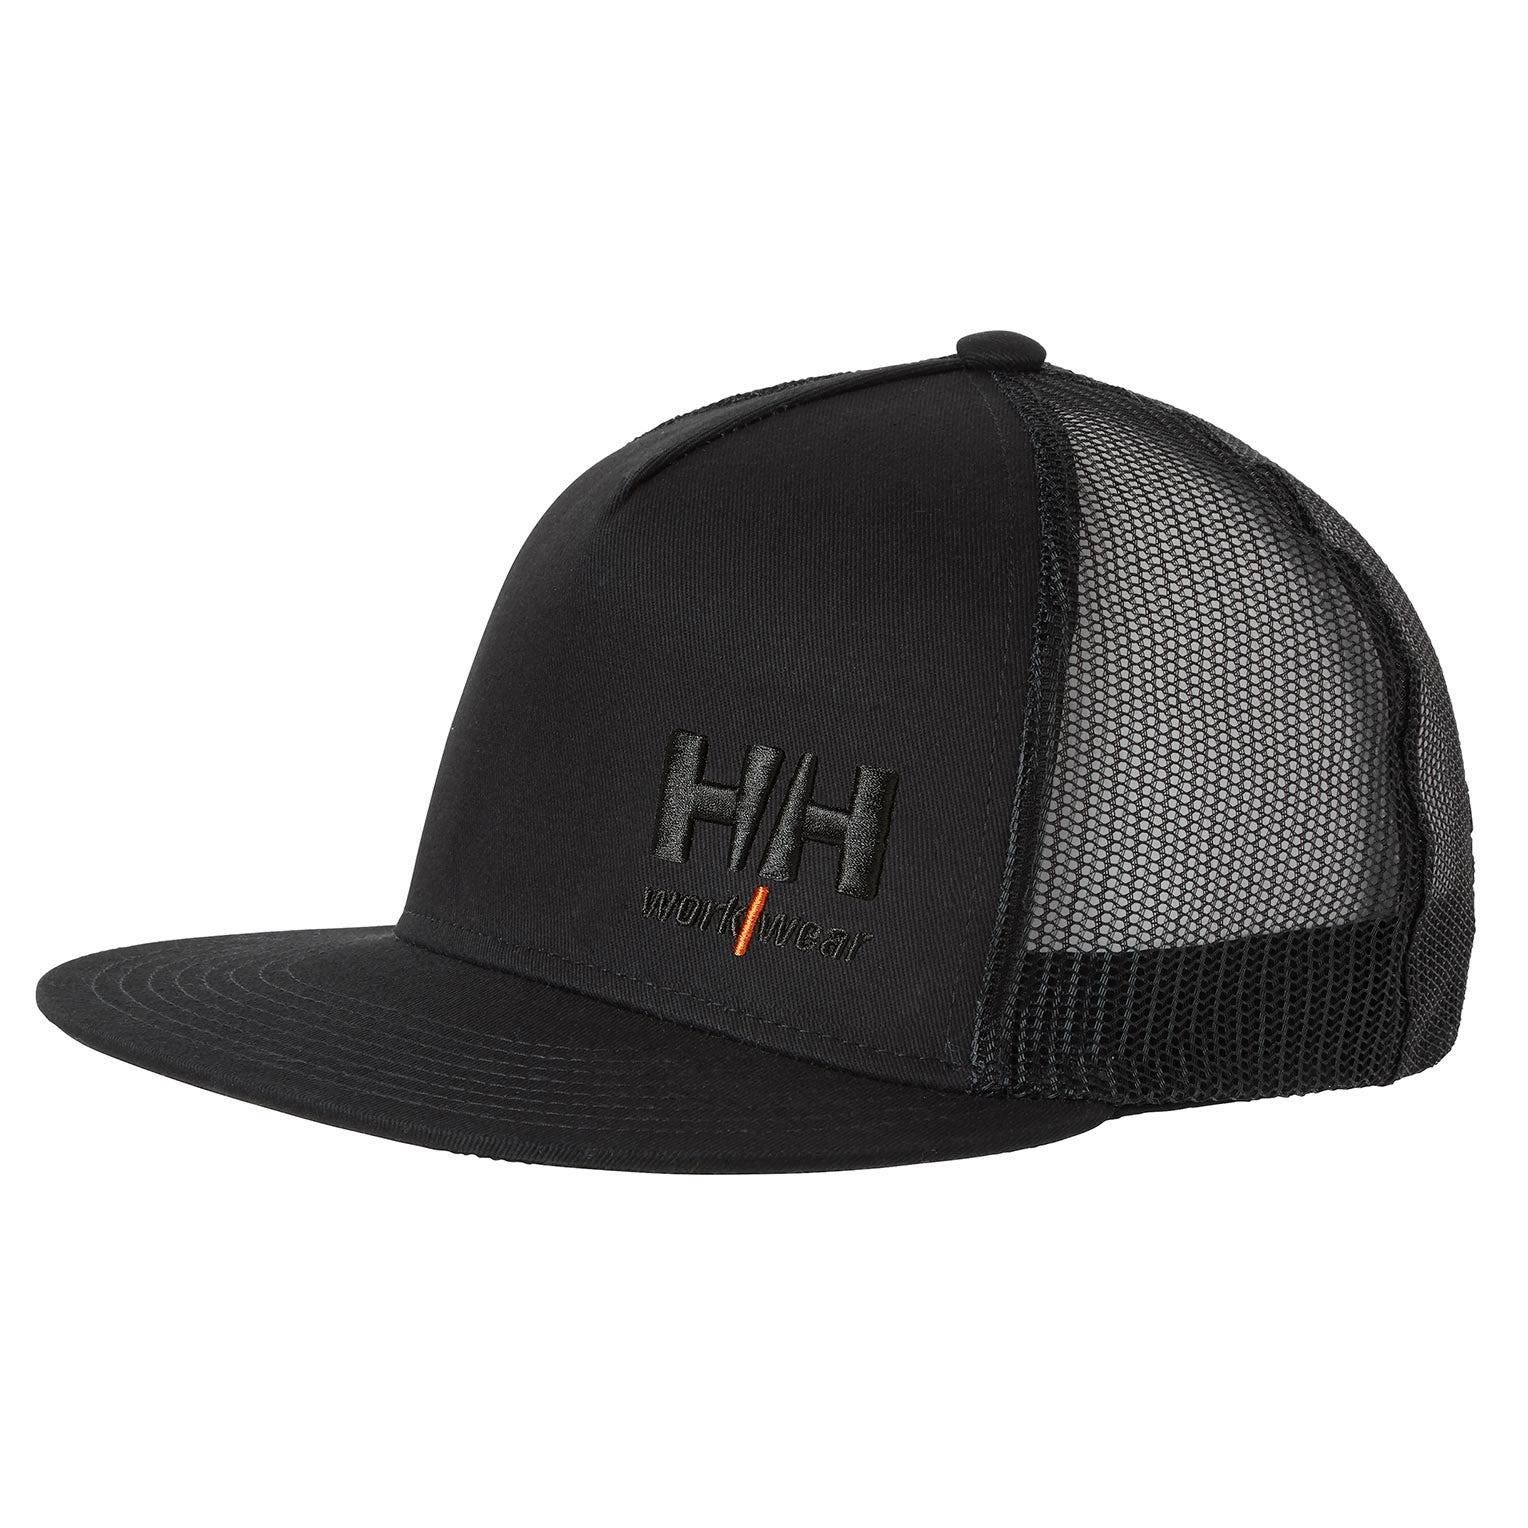 HH Workwear Helly Hansen WorkwearKensington Flat Full Crown Trucker Hat Black STD